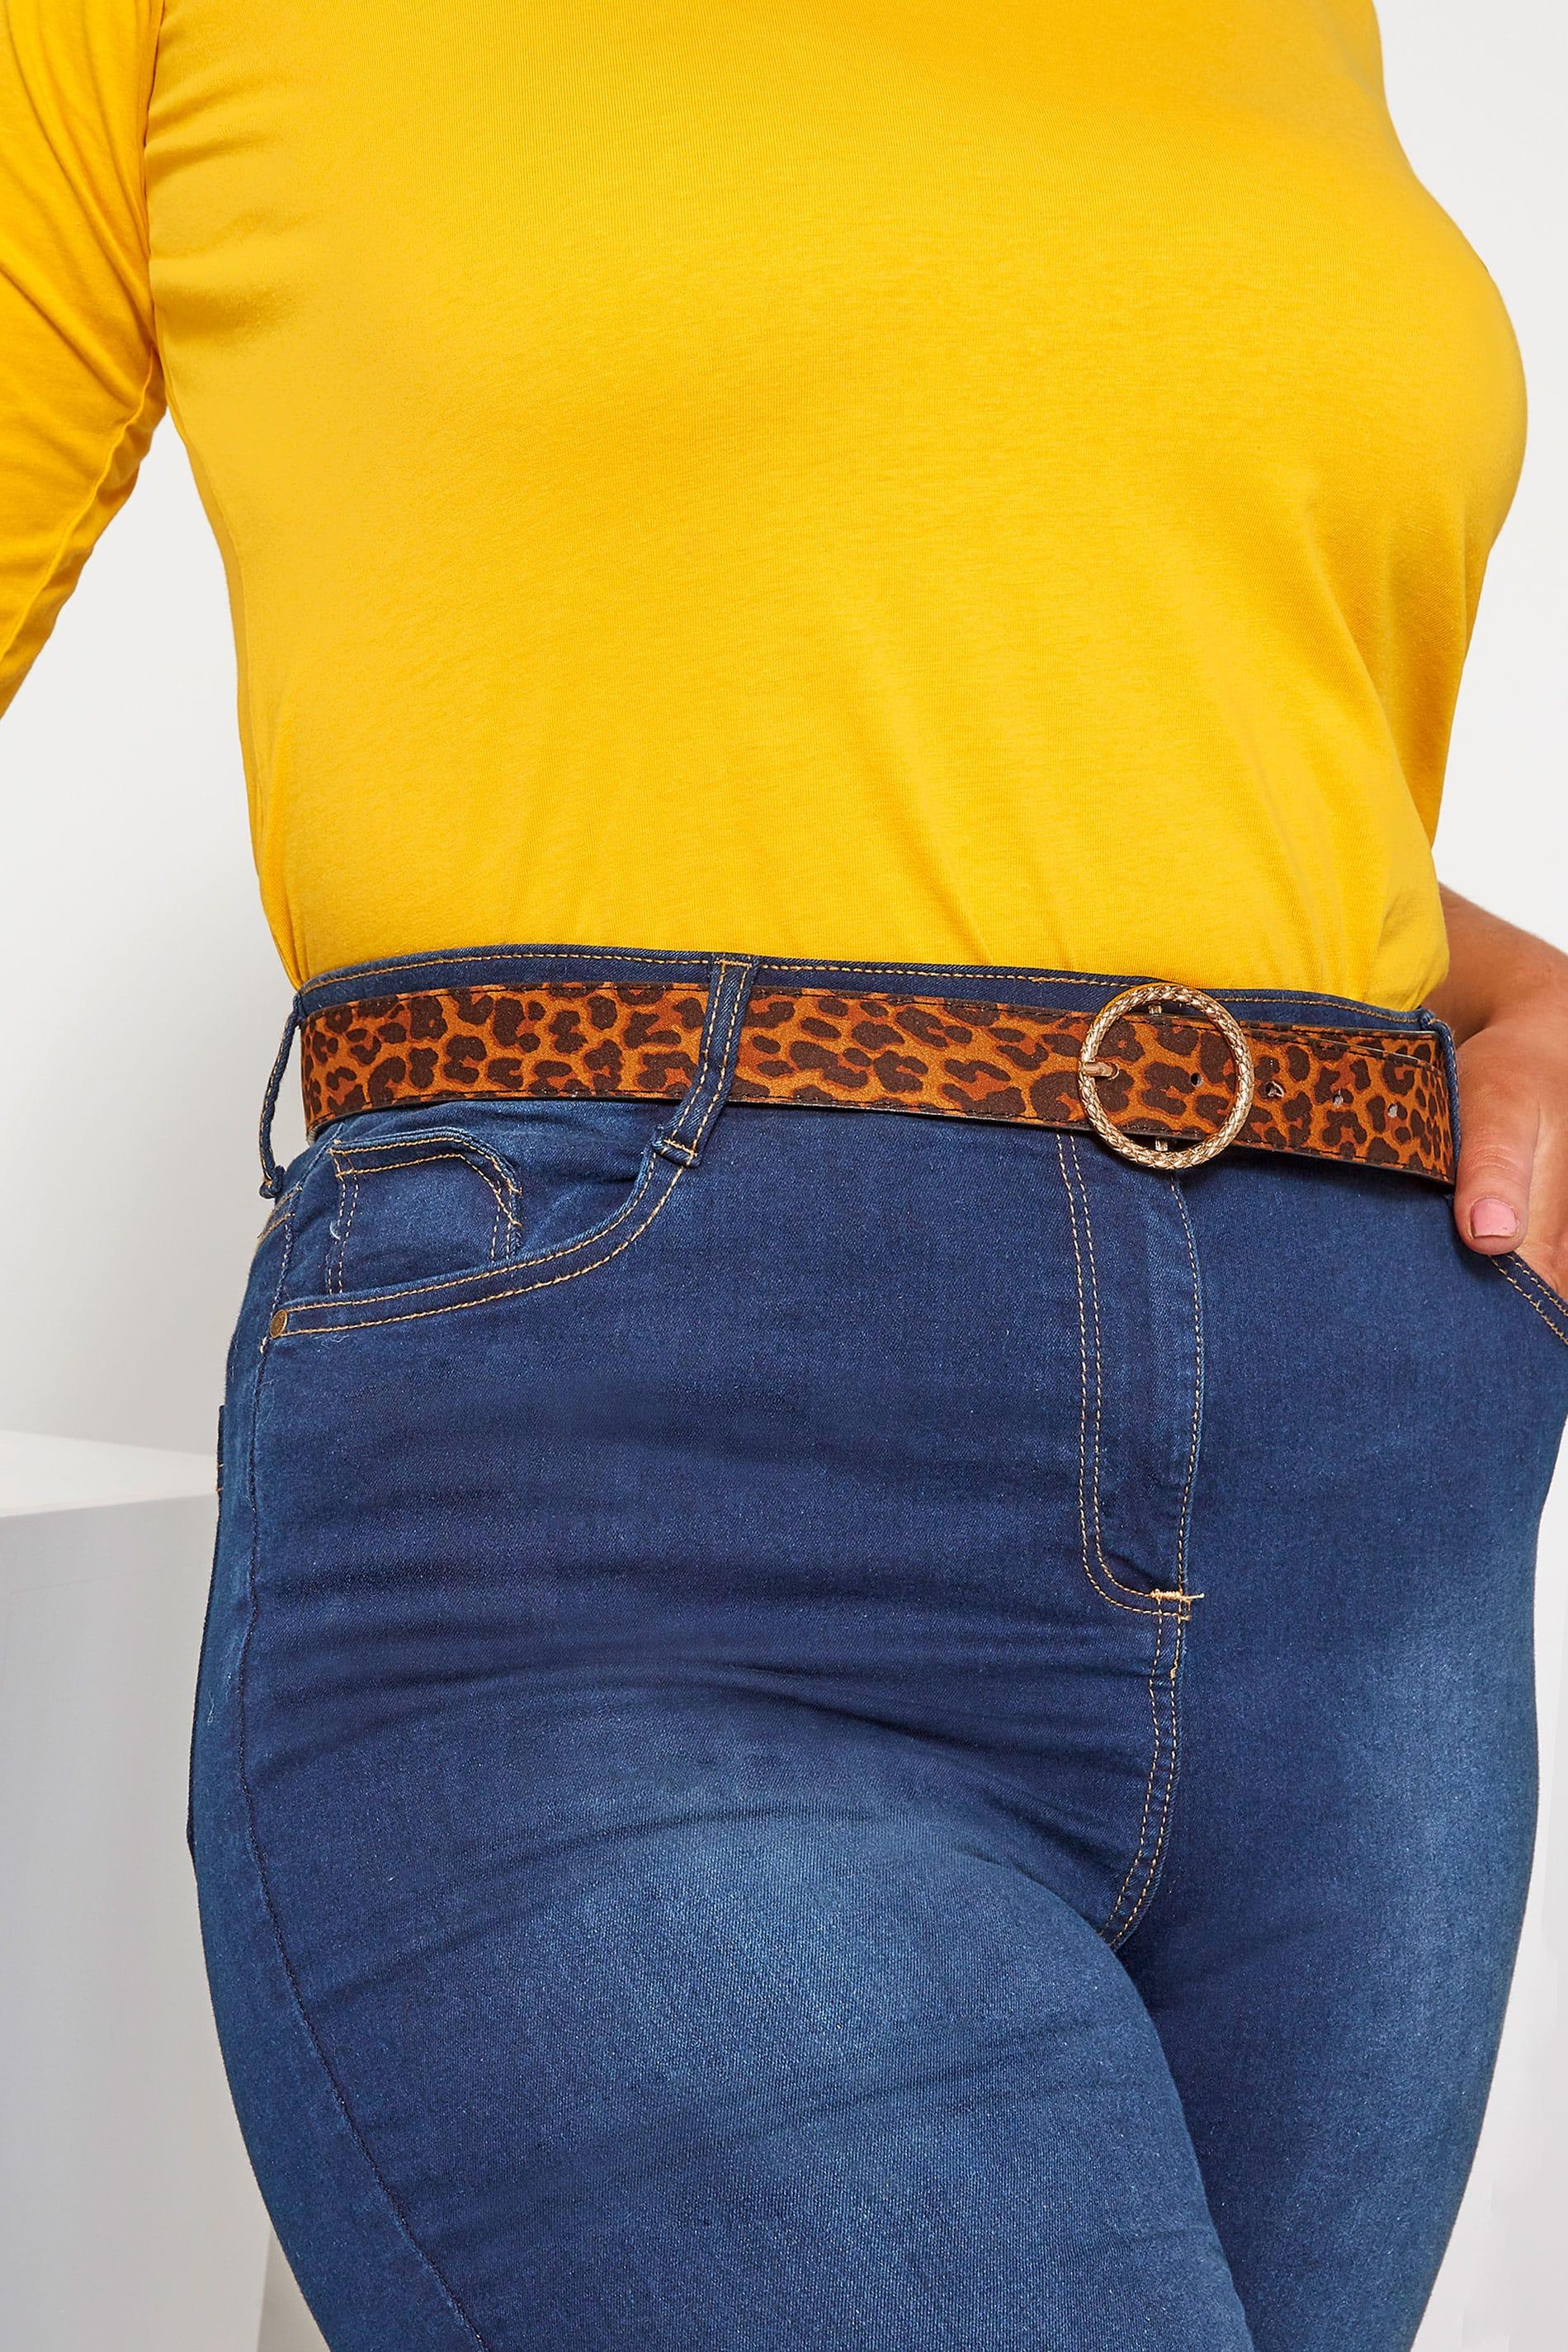 Leopard Circle Belt